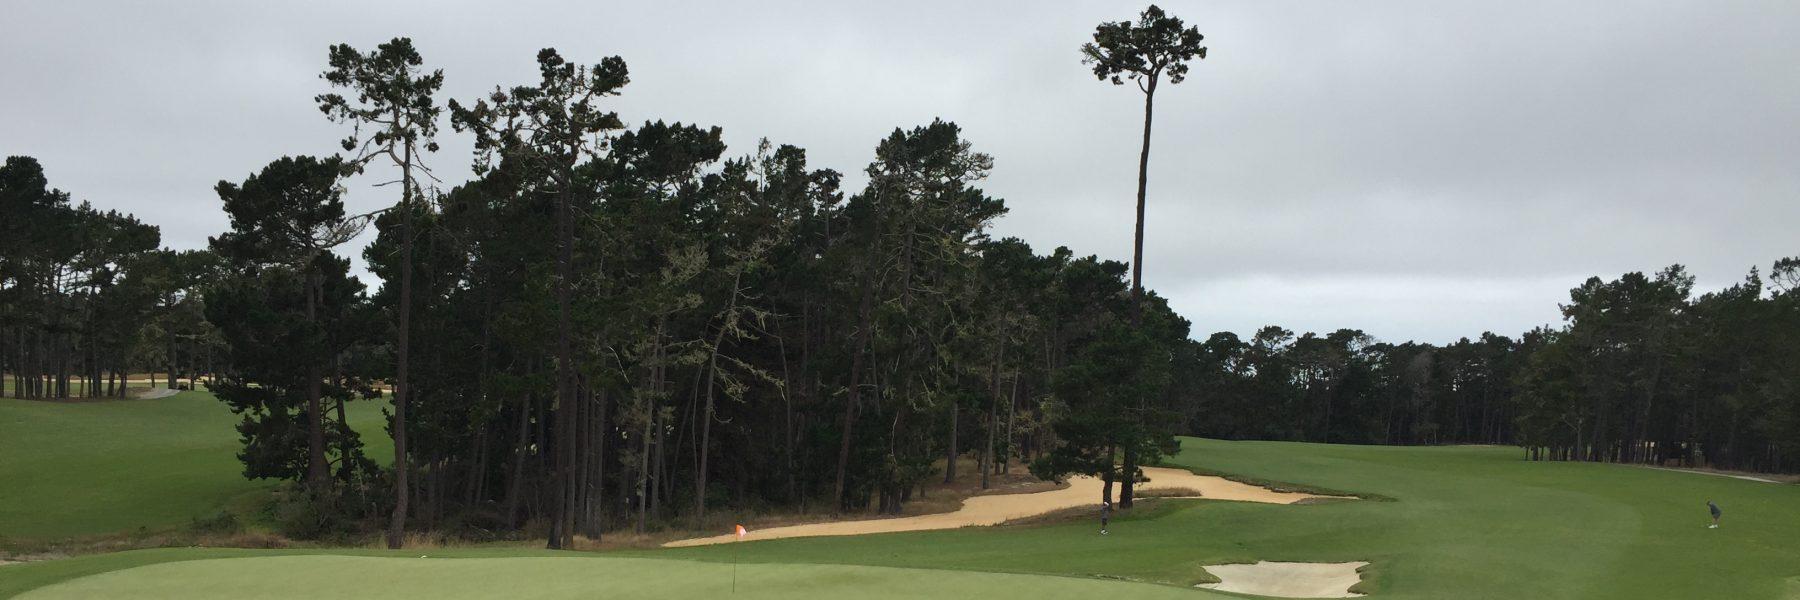 NorCal Golf Club